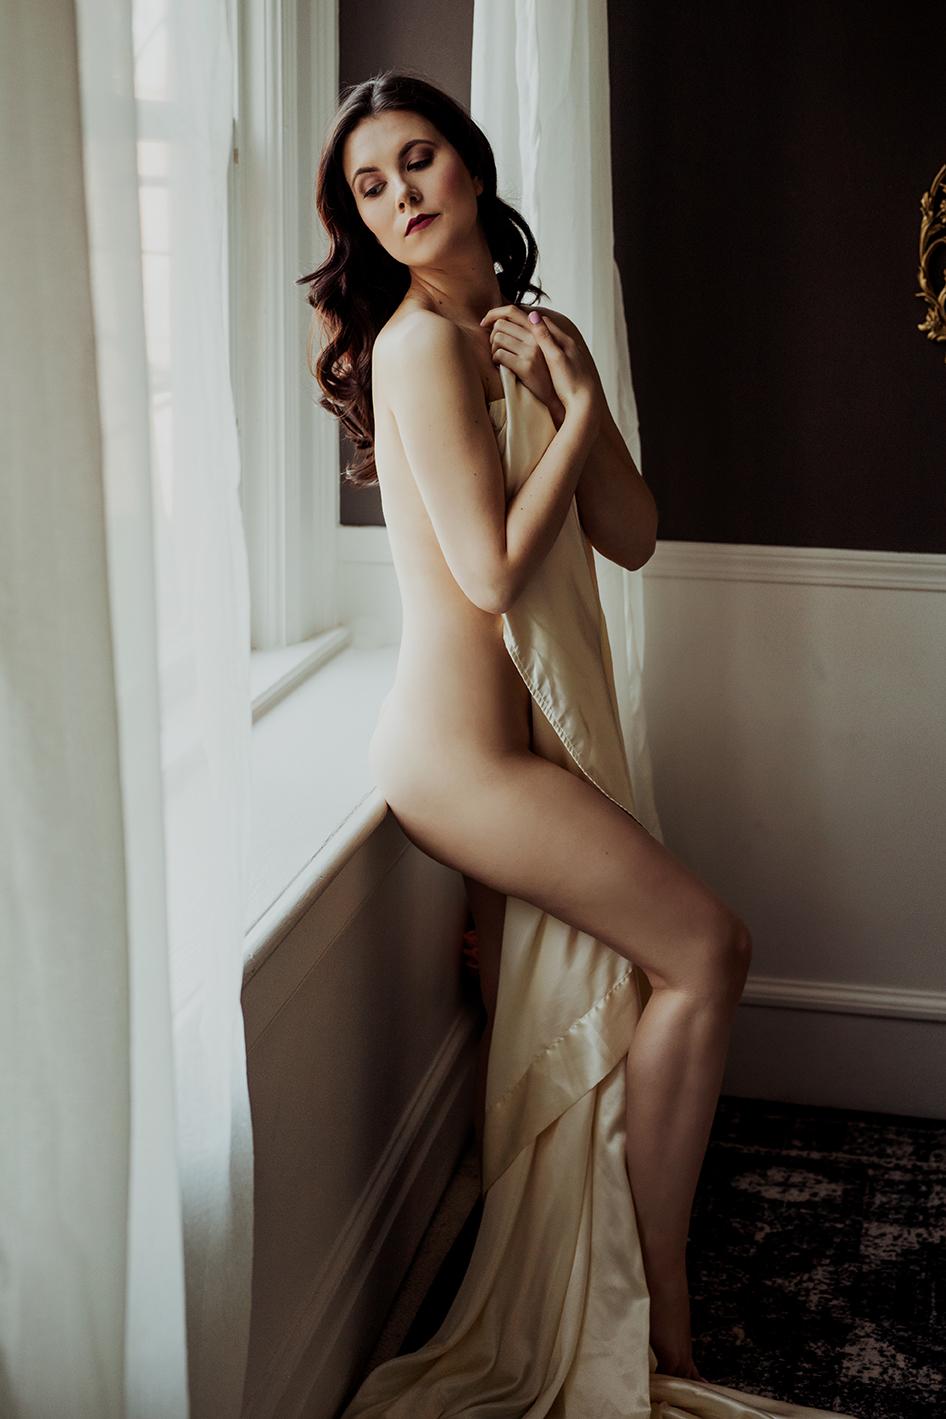 Victoria-BC-Boudoir-Photography-11.jpg